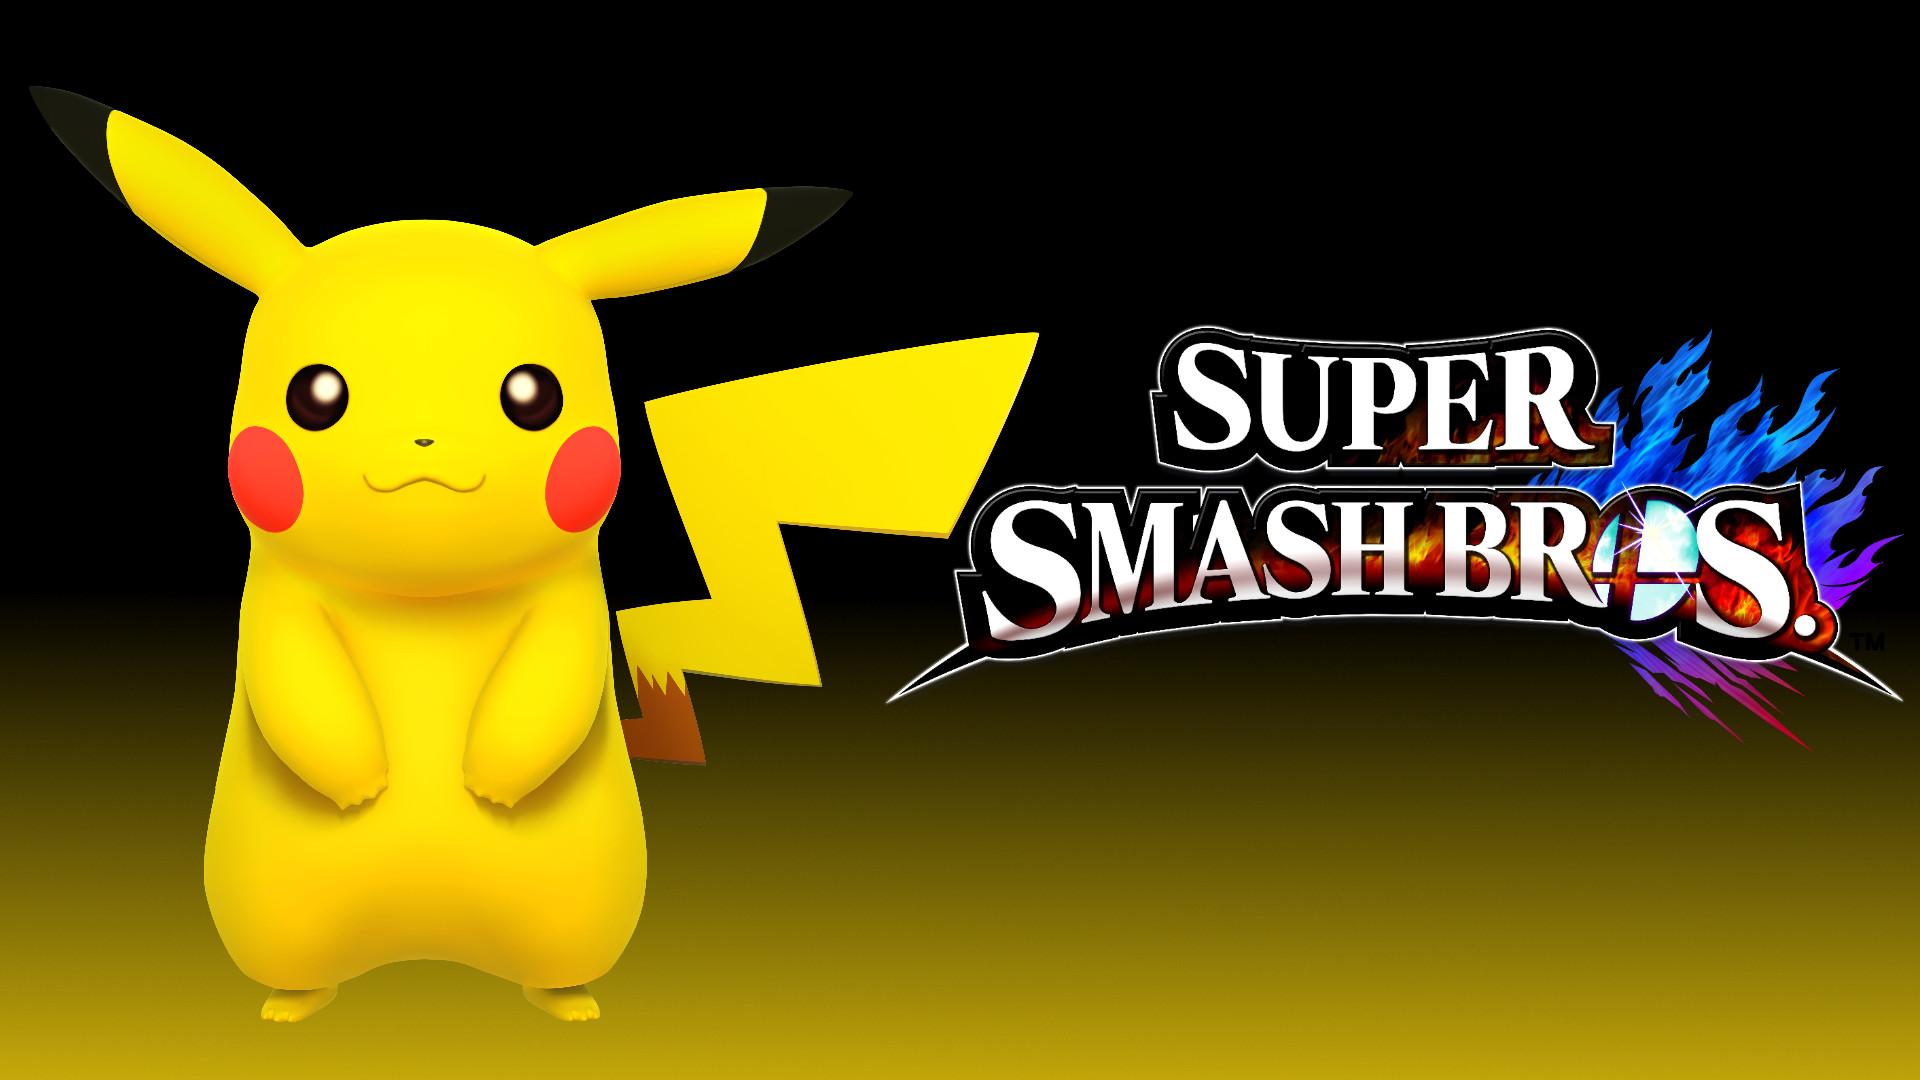 4 Wallpaper – Pikachu by TheWolfGalaxy Super Smash Bros. 4 Wallpaper –  Pikachu by TheWolfGalaxy